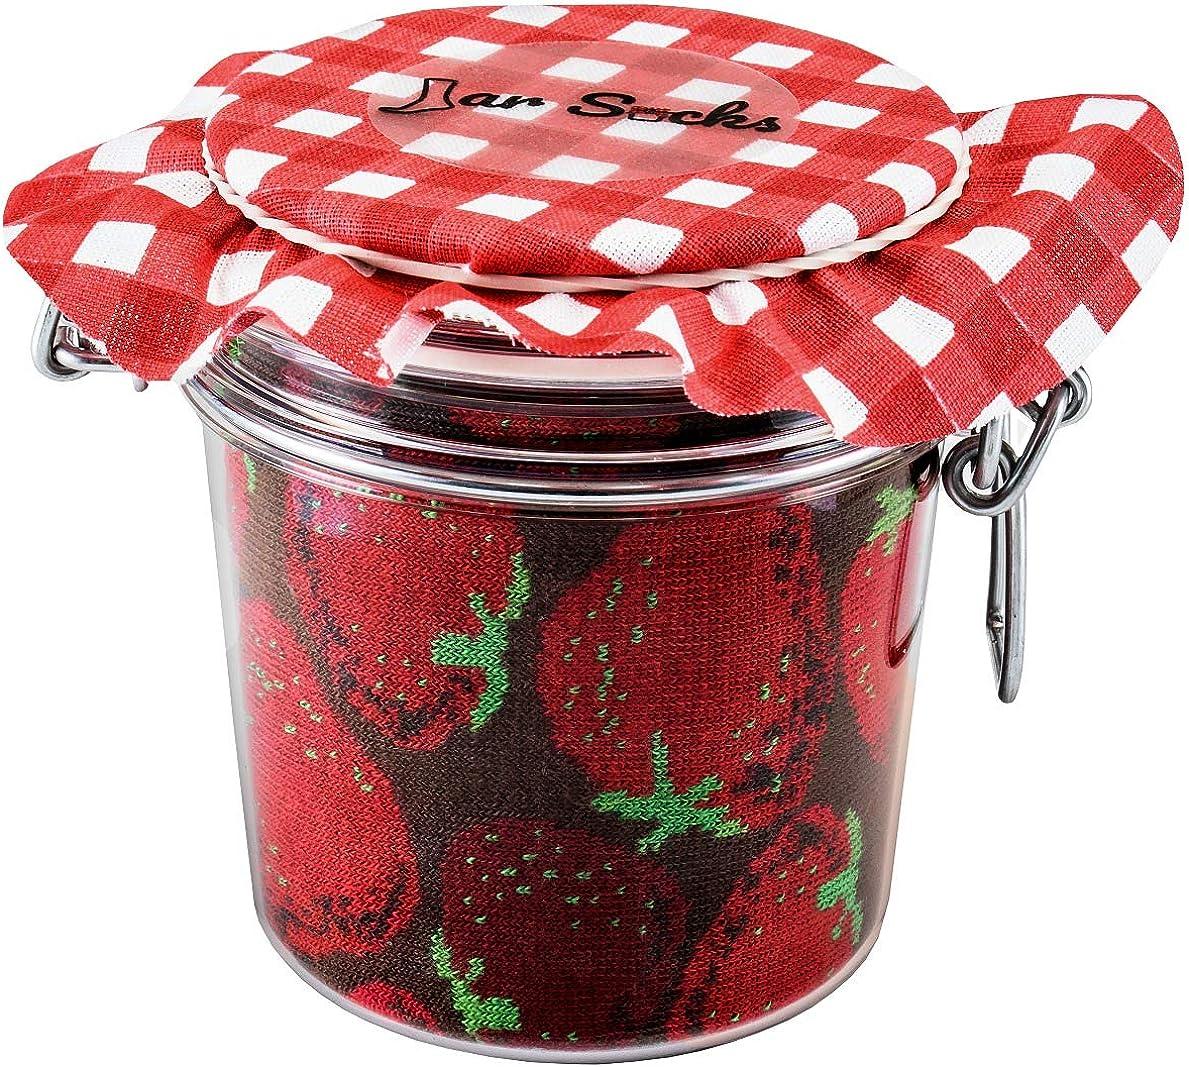 Rainbow Socks - JAR SOCKS Strawberries Blueberries Funny Gift - Unisex - 2 Pairs